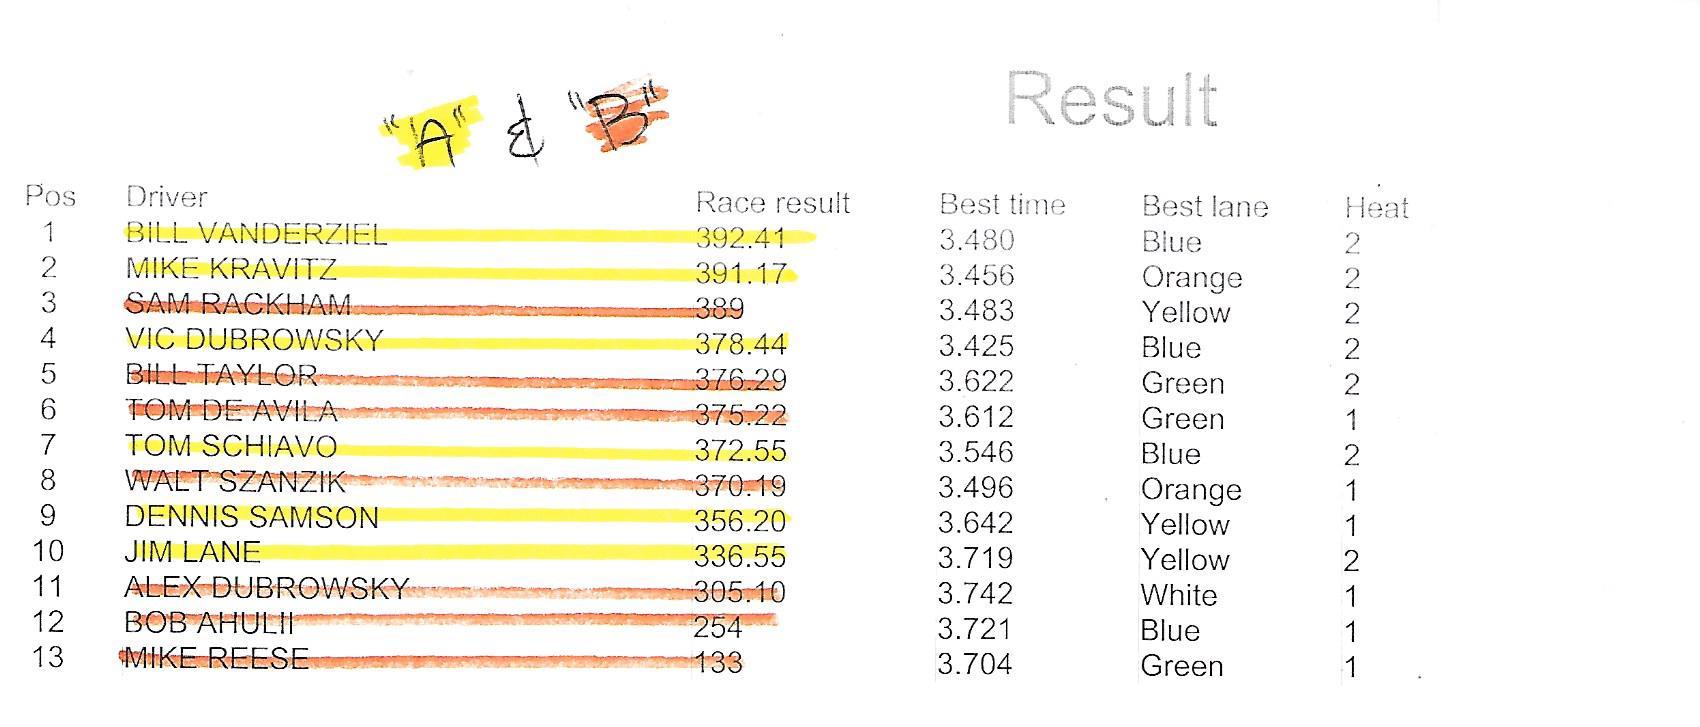 111518 lmp king results.jpeg